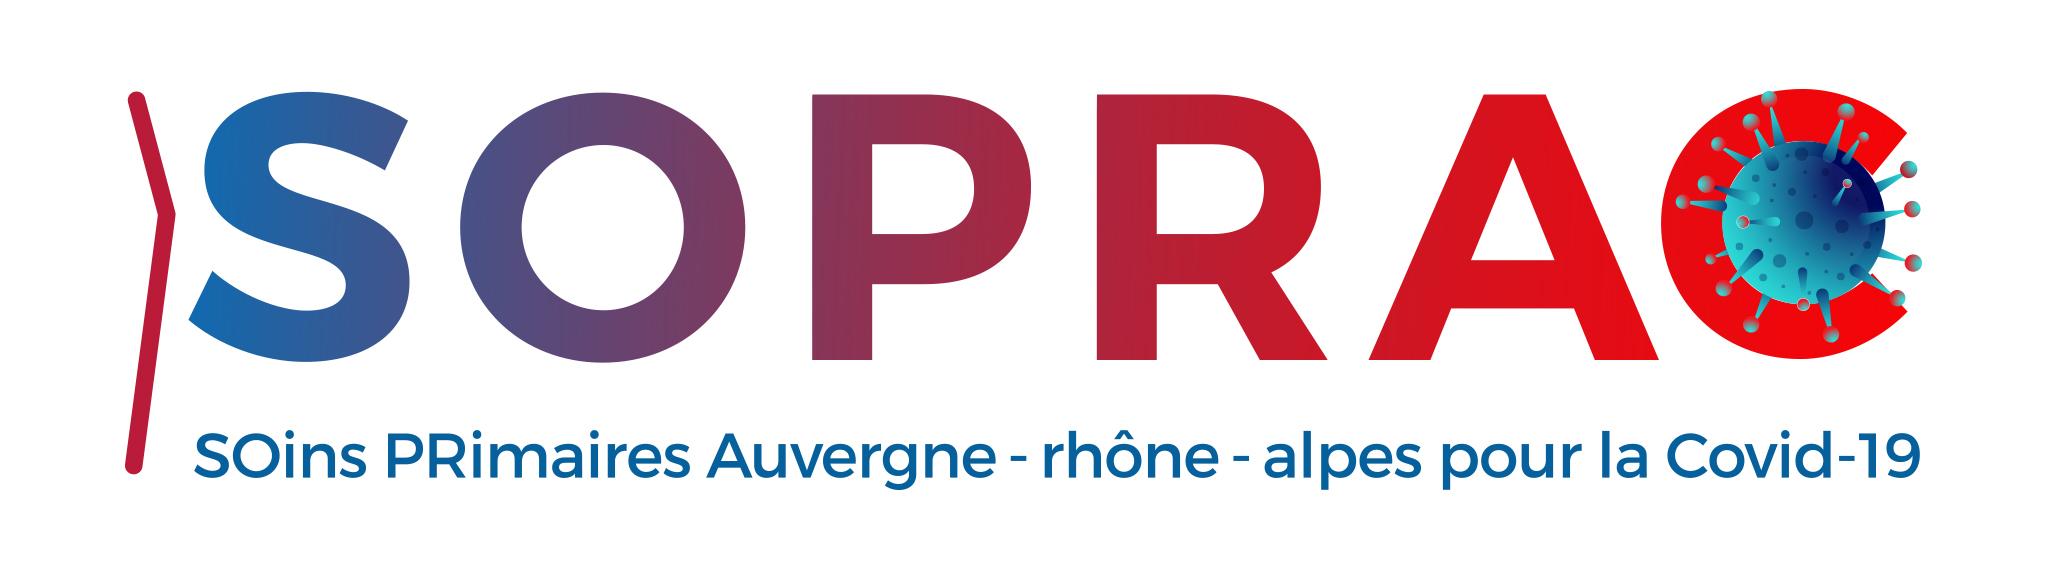 logo-SOPRAC-retenu.jpg